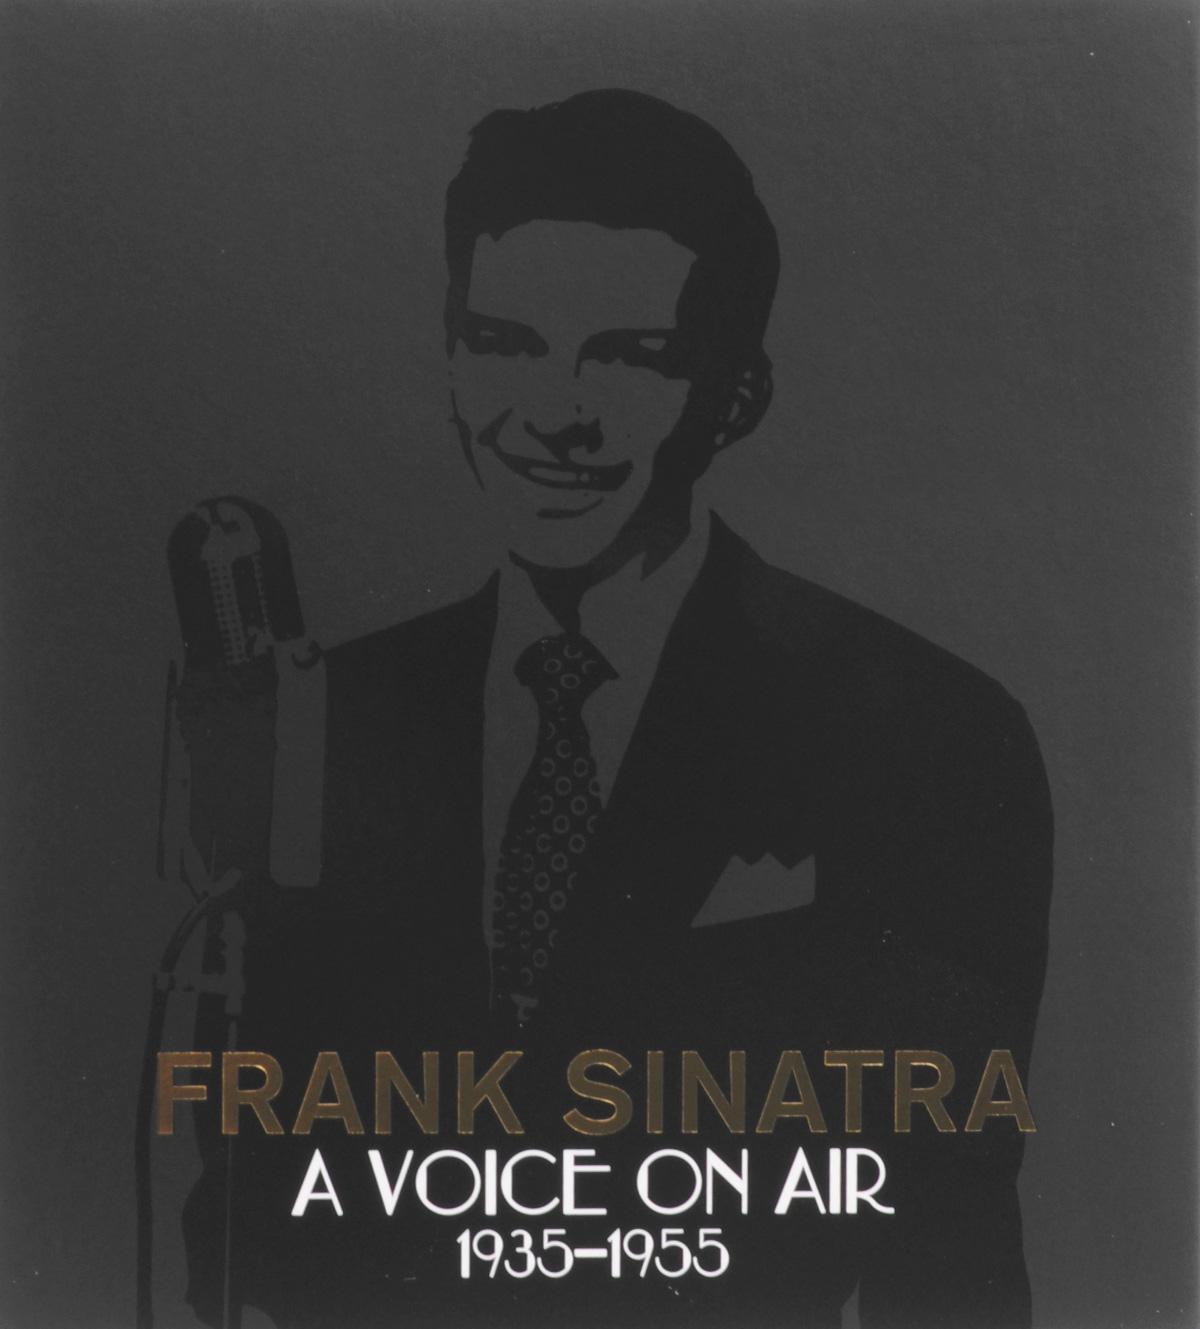 Фрэнк Синатра Frank Sinatra. A Voice On Air (1935-1955) (4 CD) cd frank sinatra a voice on air 1935 1955